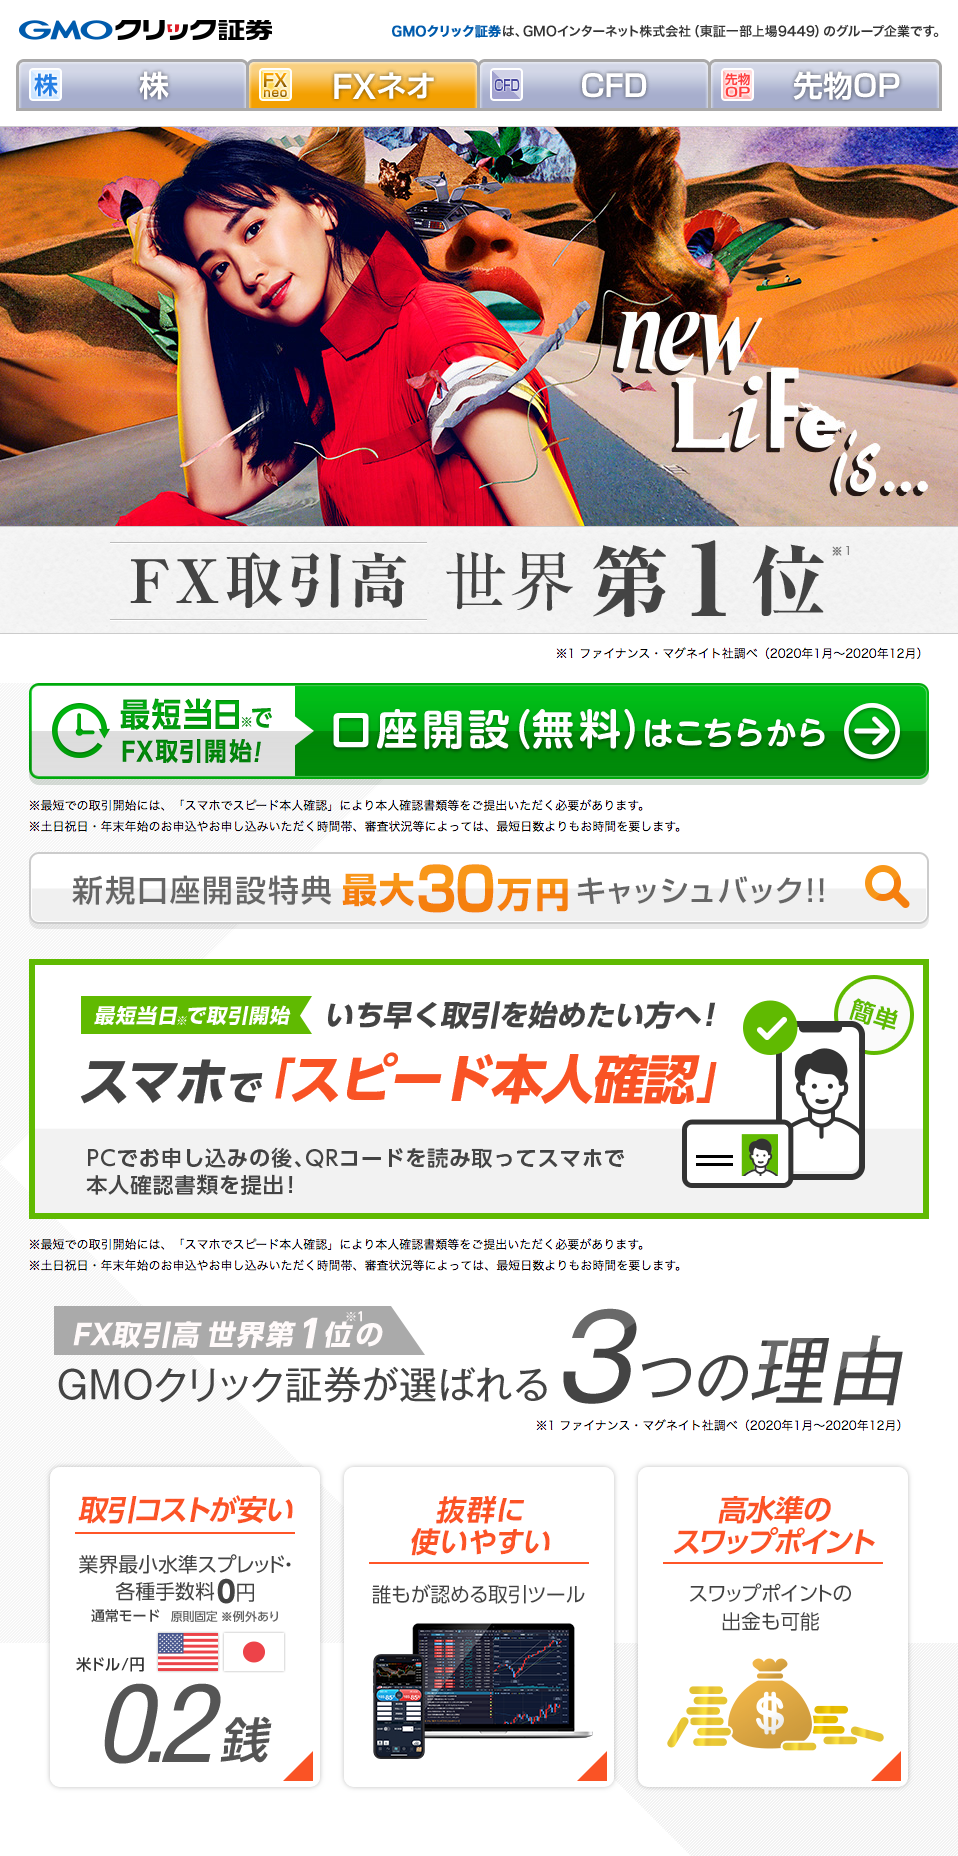 GMOクリック証券 広告